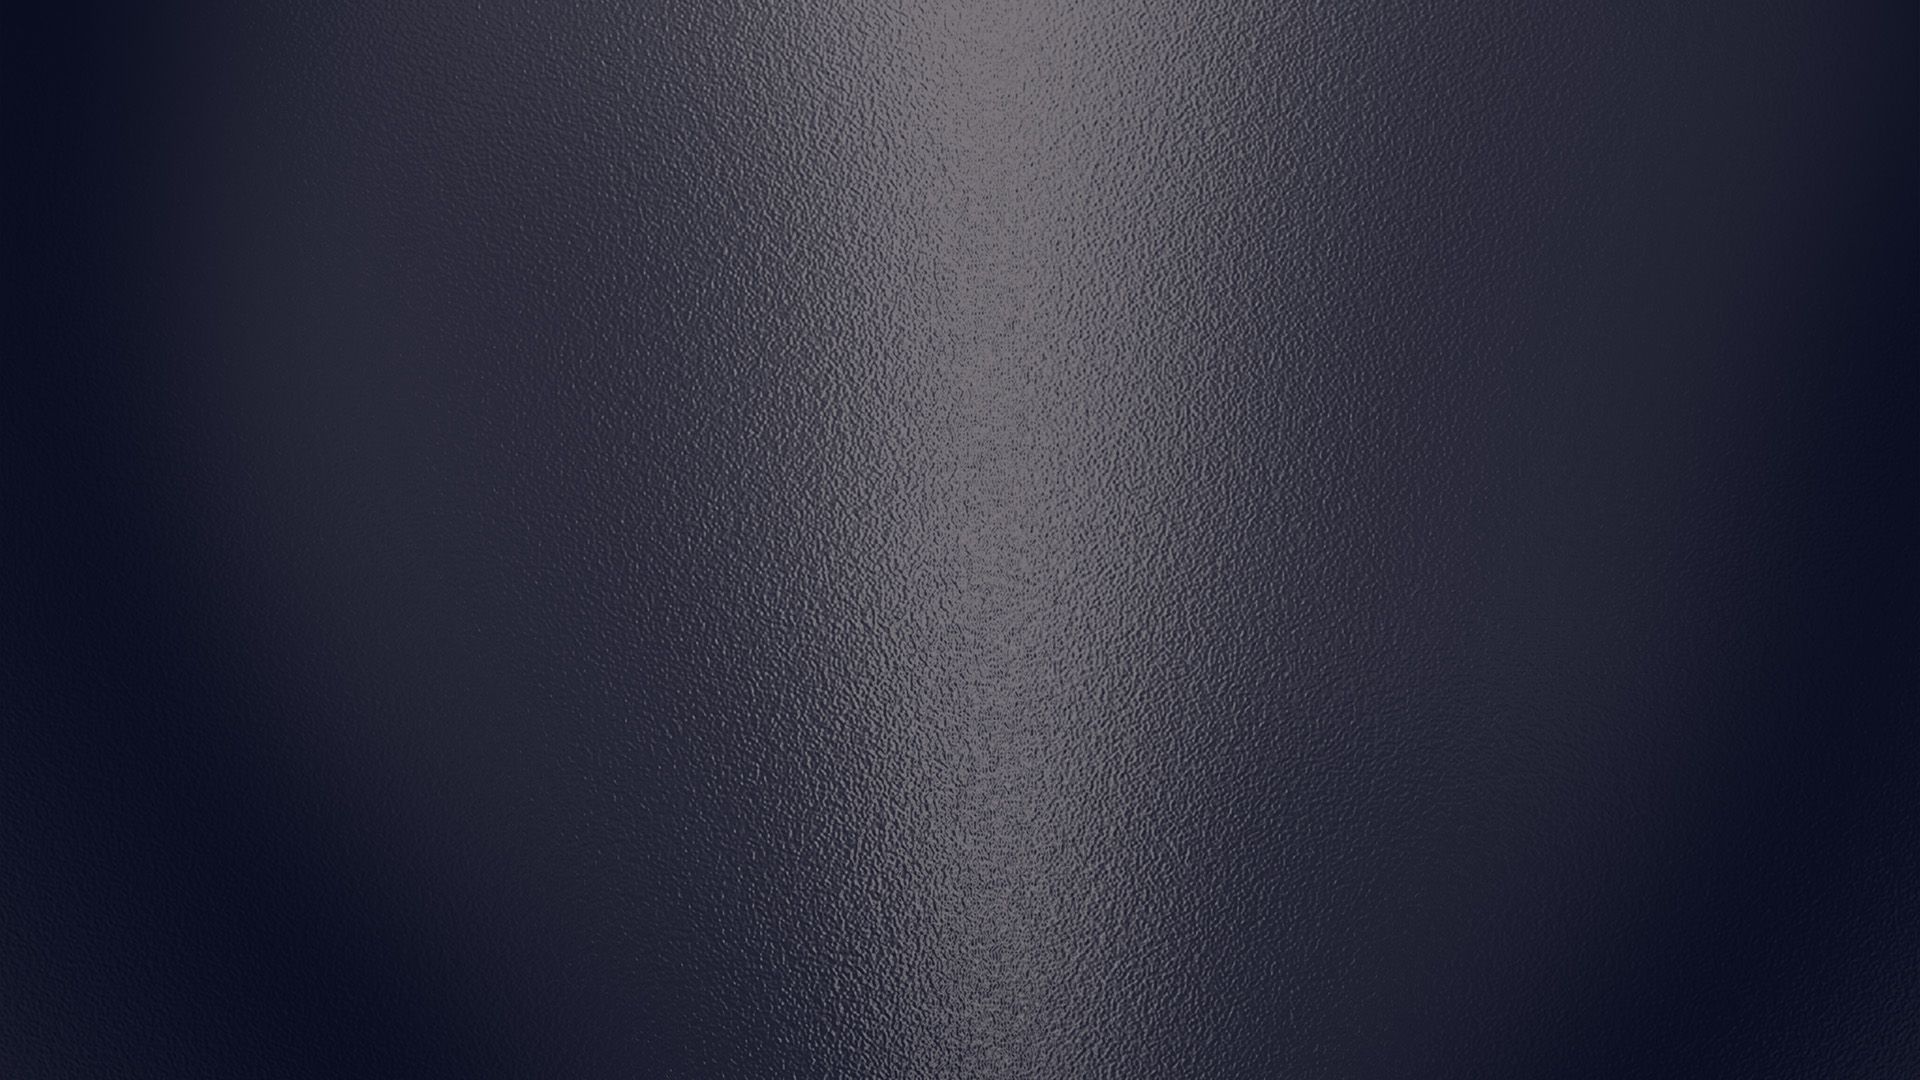 Stainless Steel desktop wallpaper download